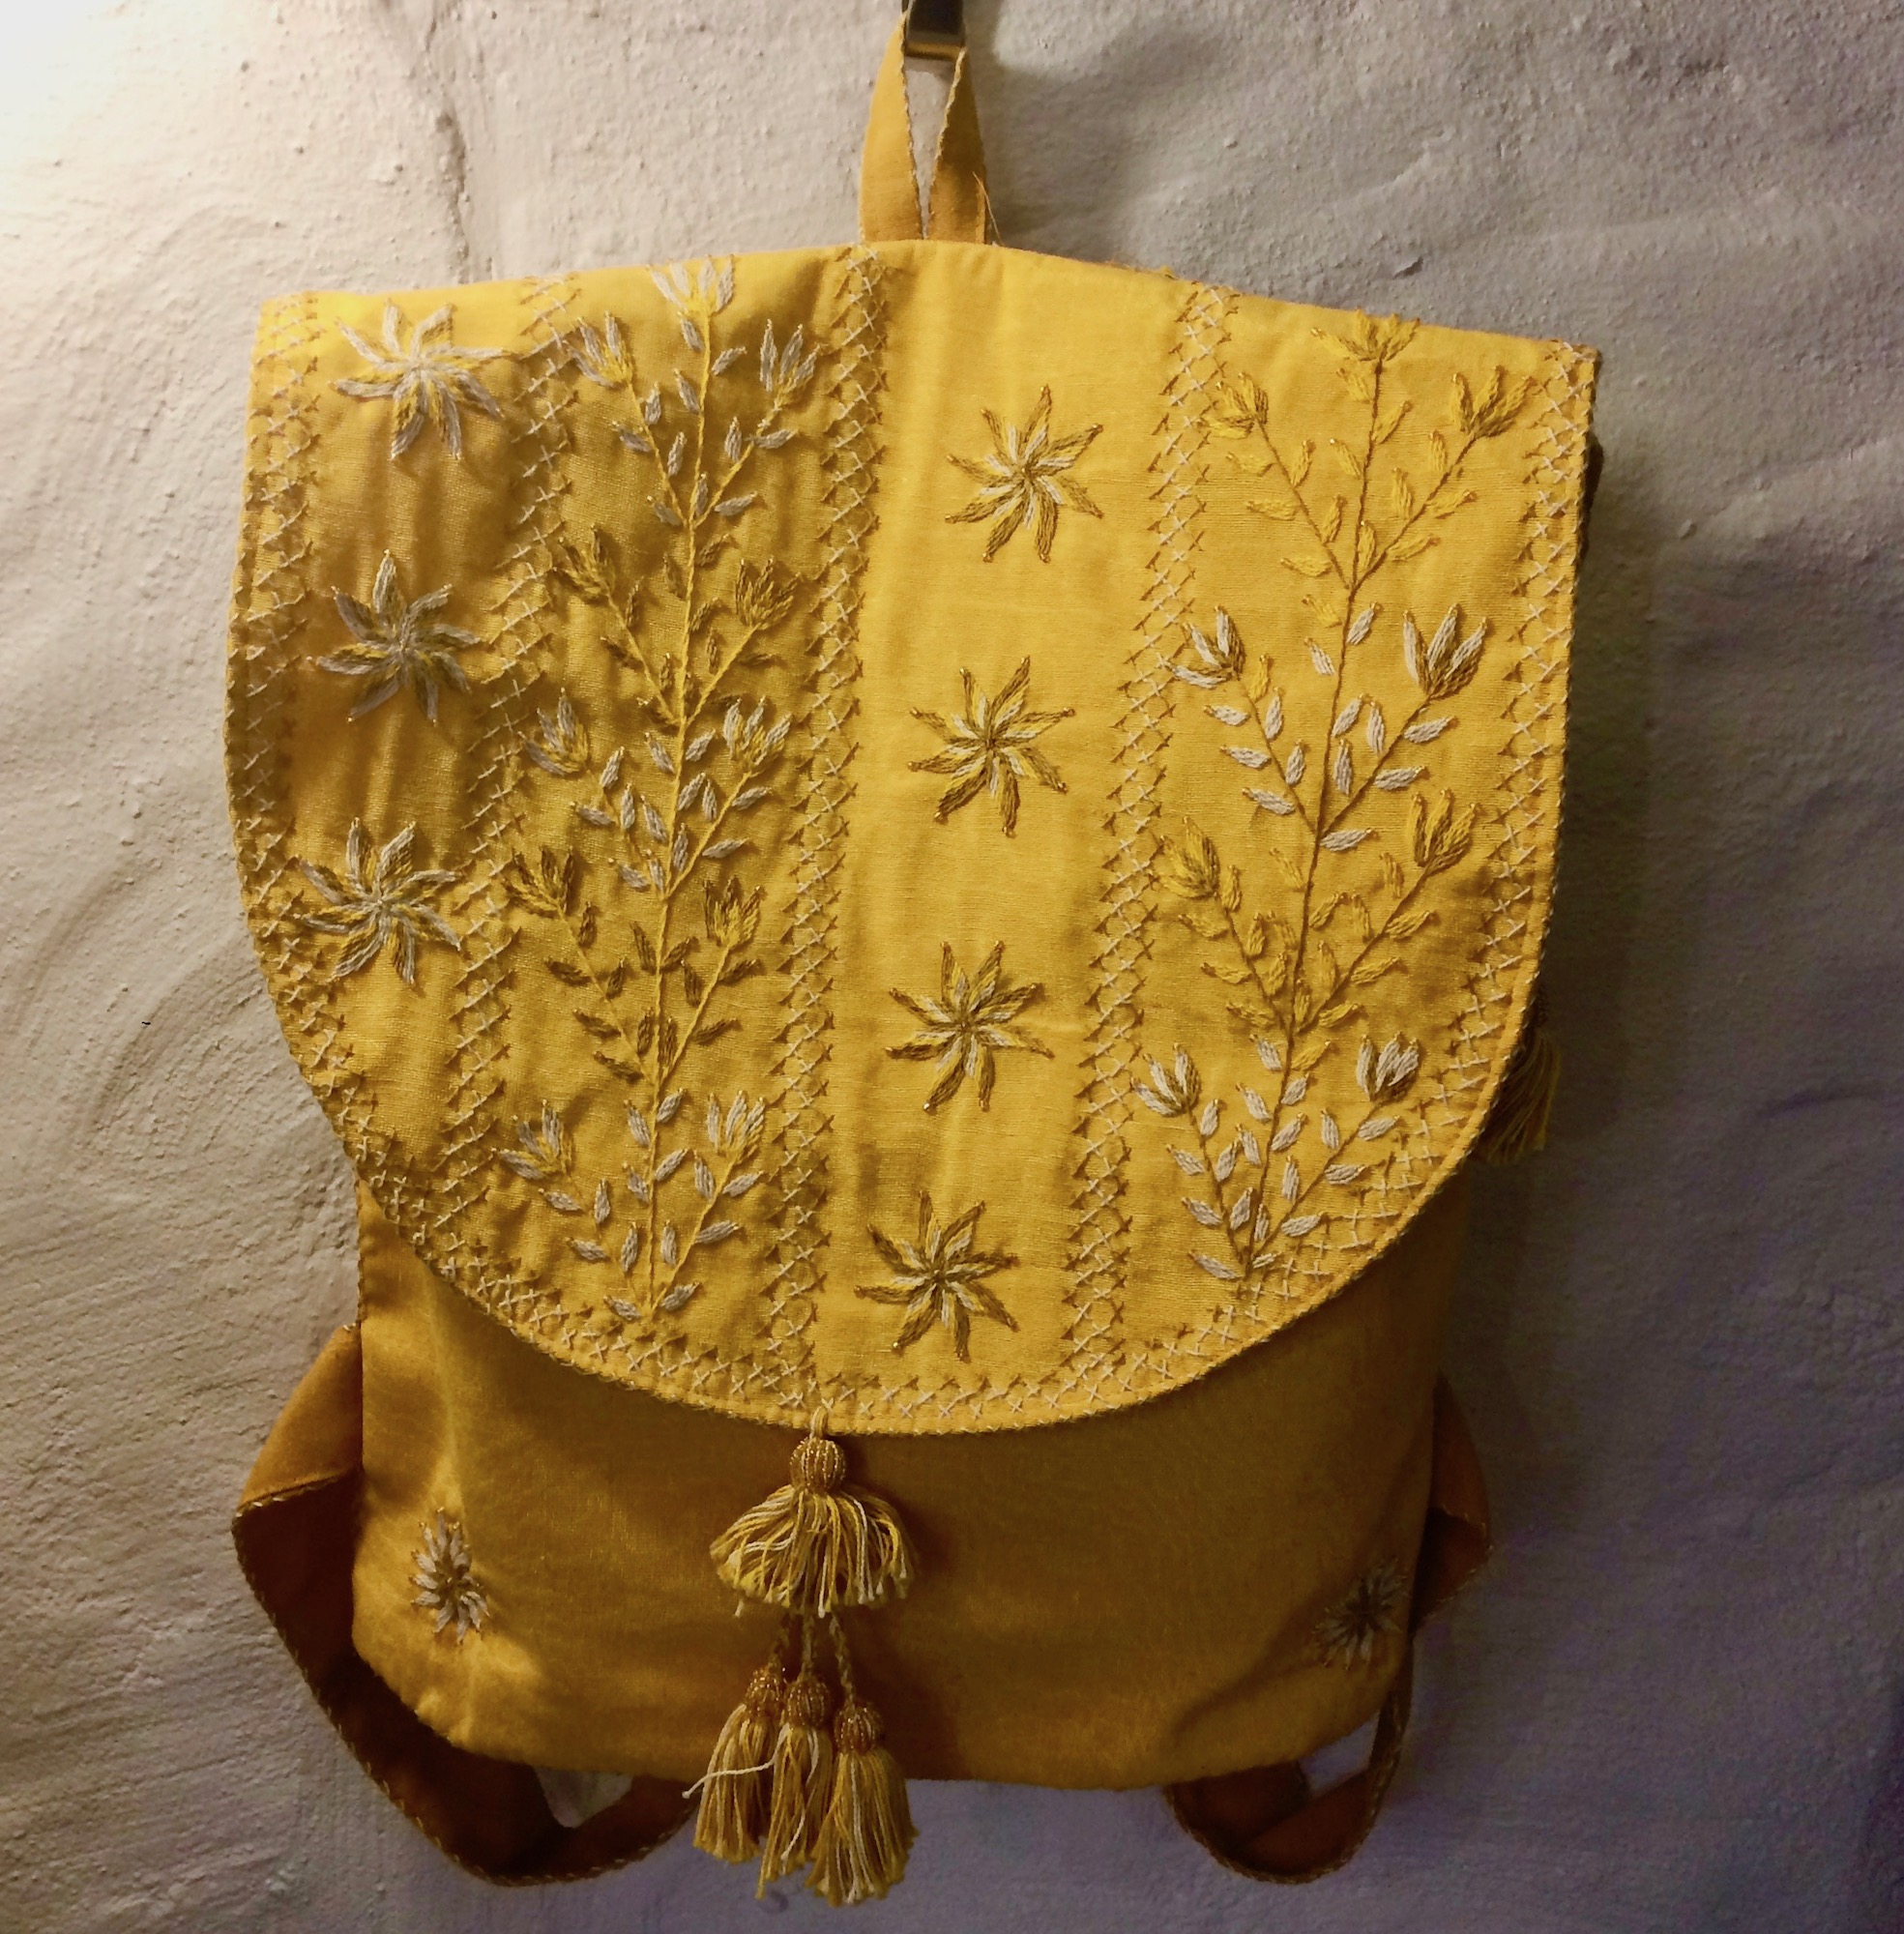 Bedouin Embroidered Rucksack